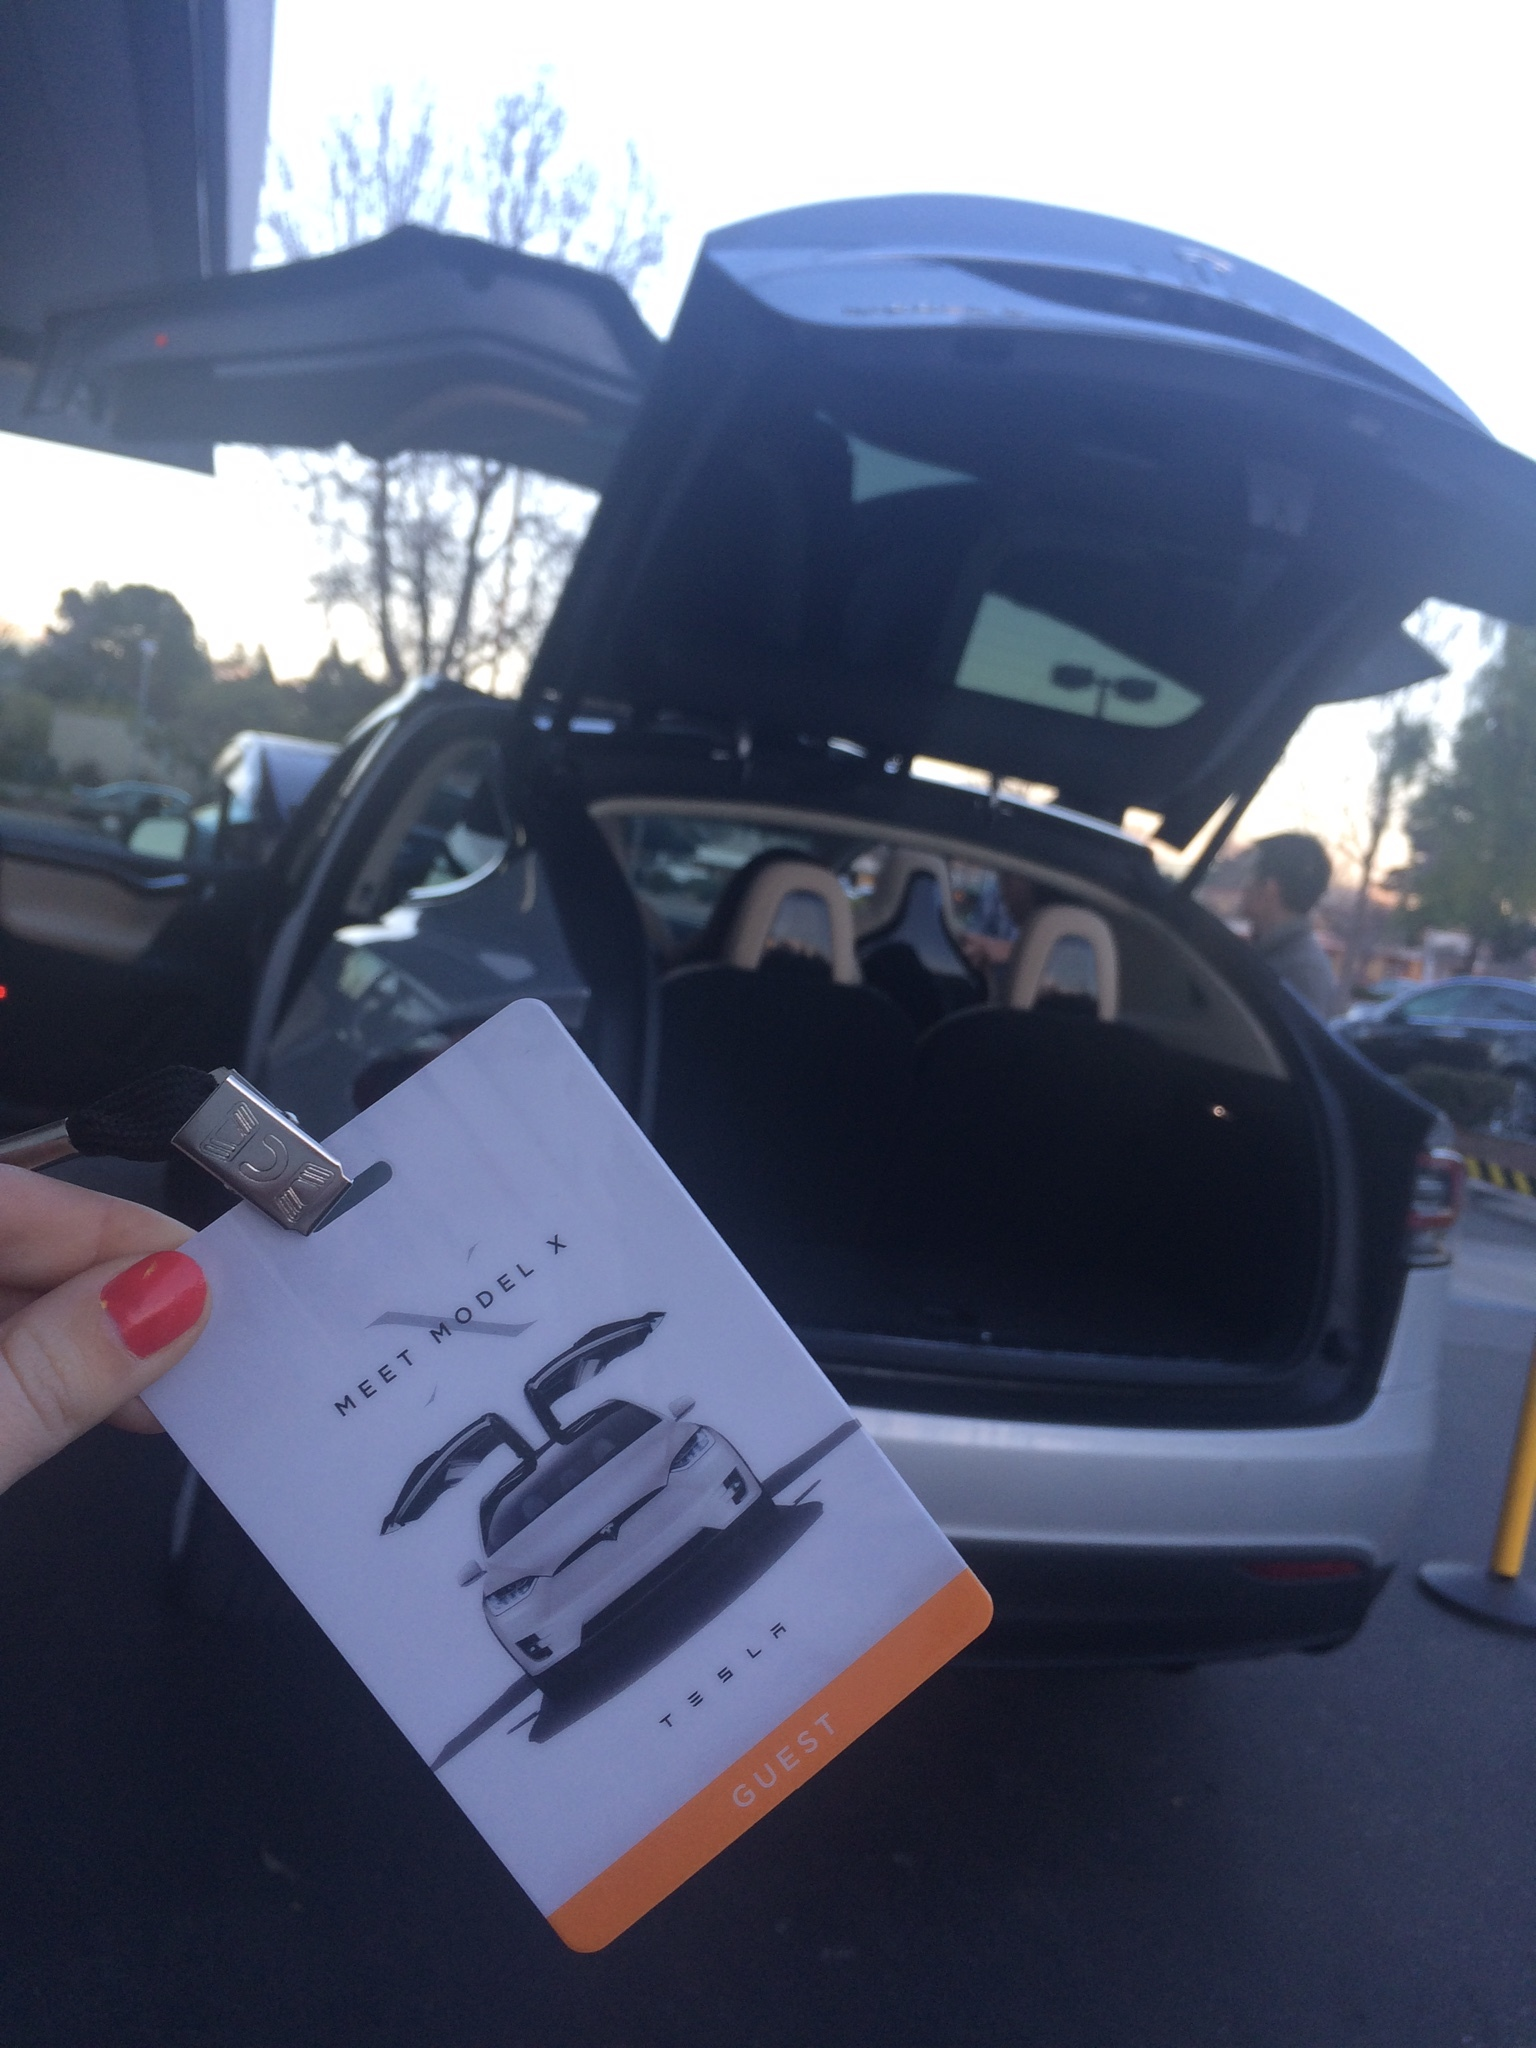 IT'S ELECTRIC! Test-driving a  Tesla  car...